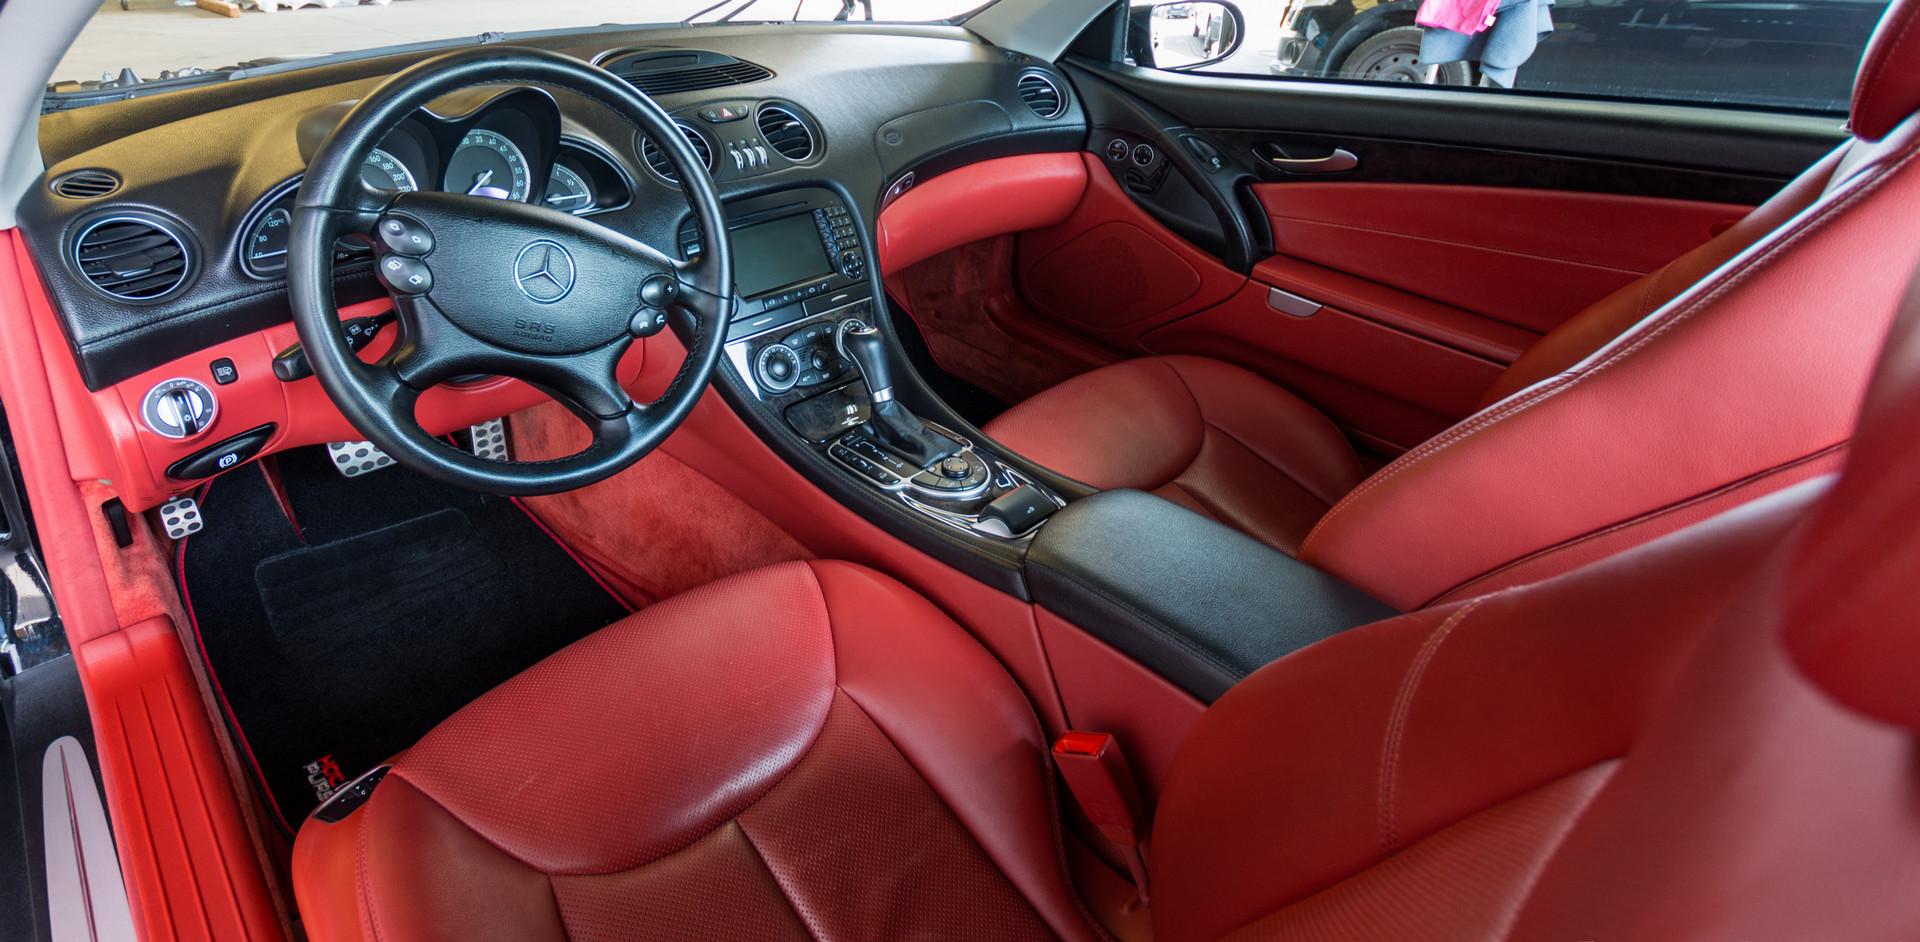 Mercedes CLS350_3_resize.JPG